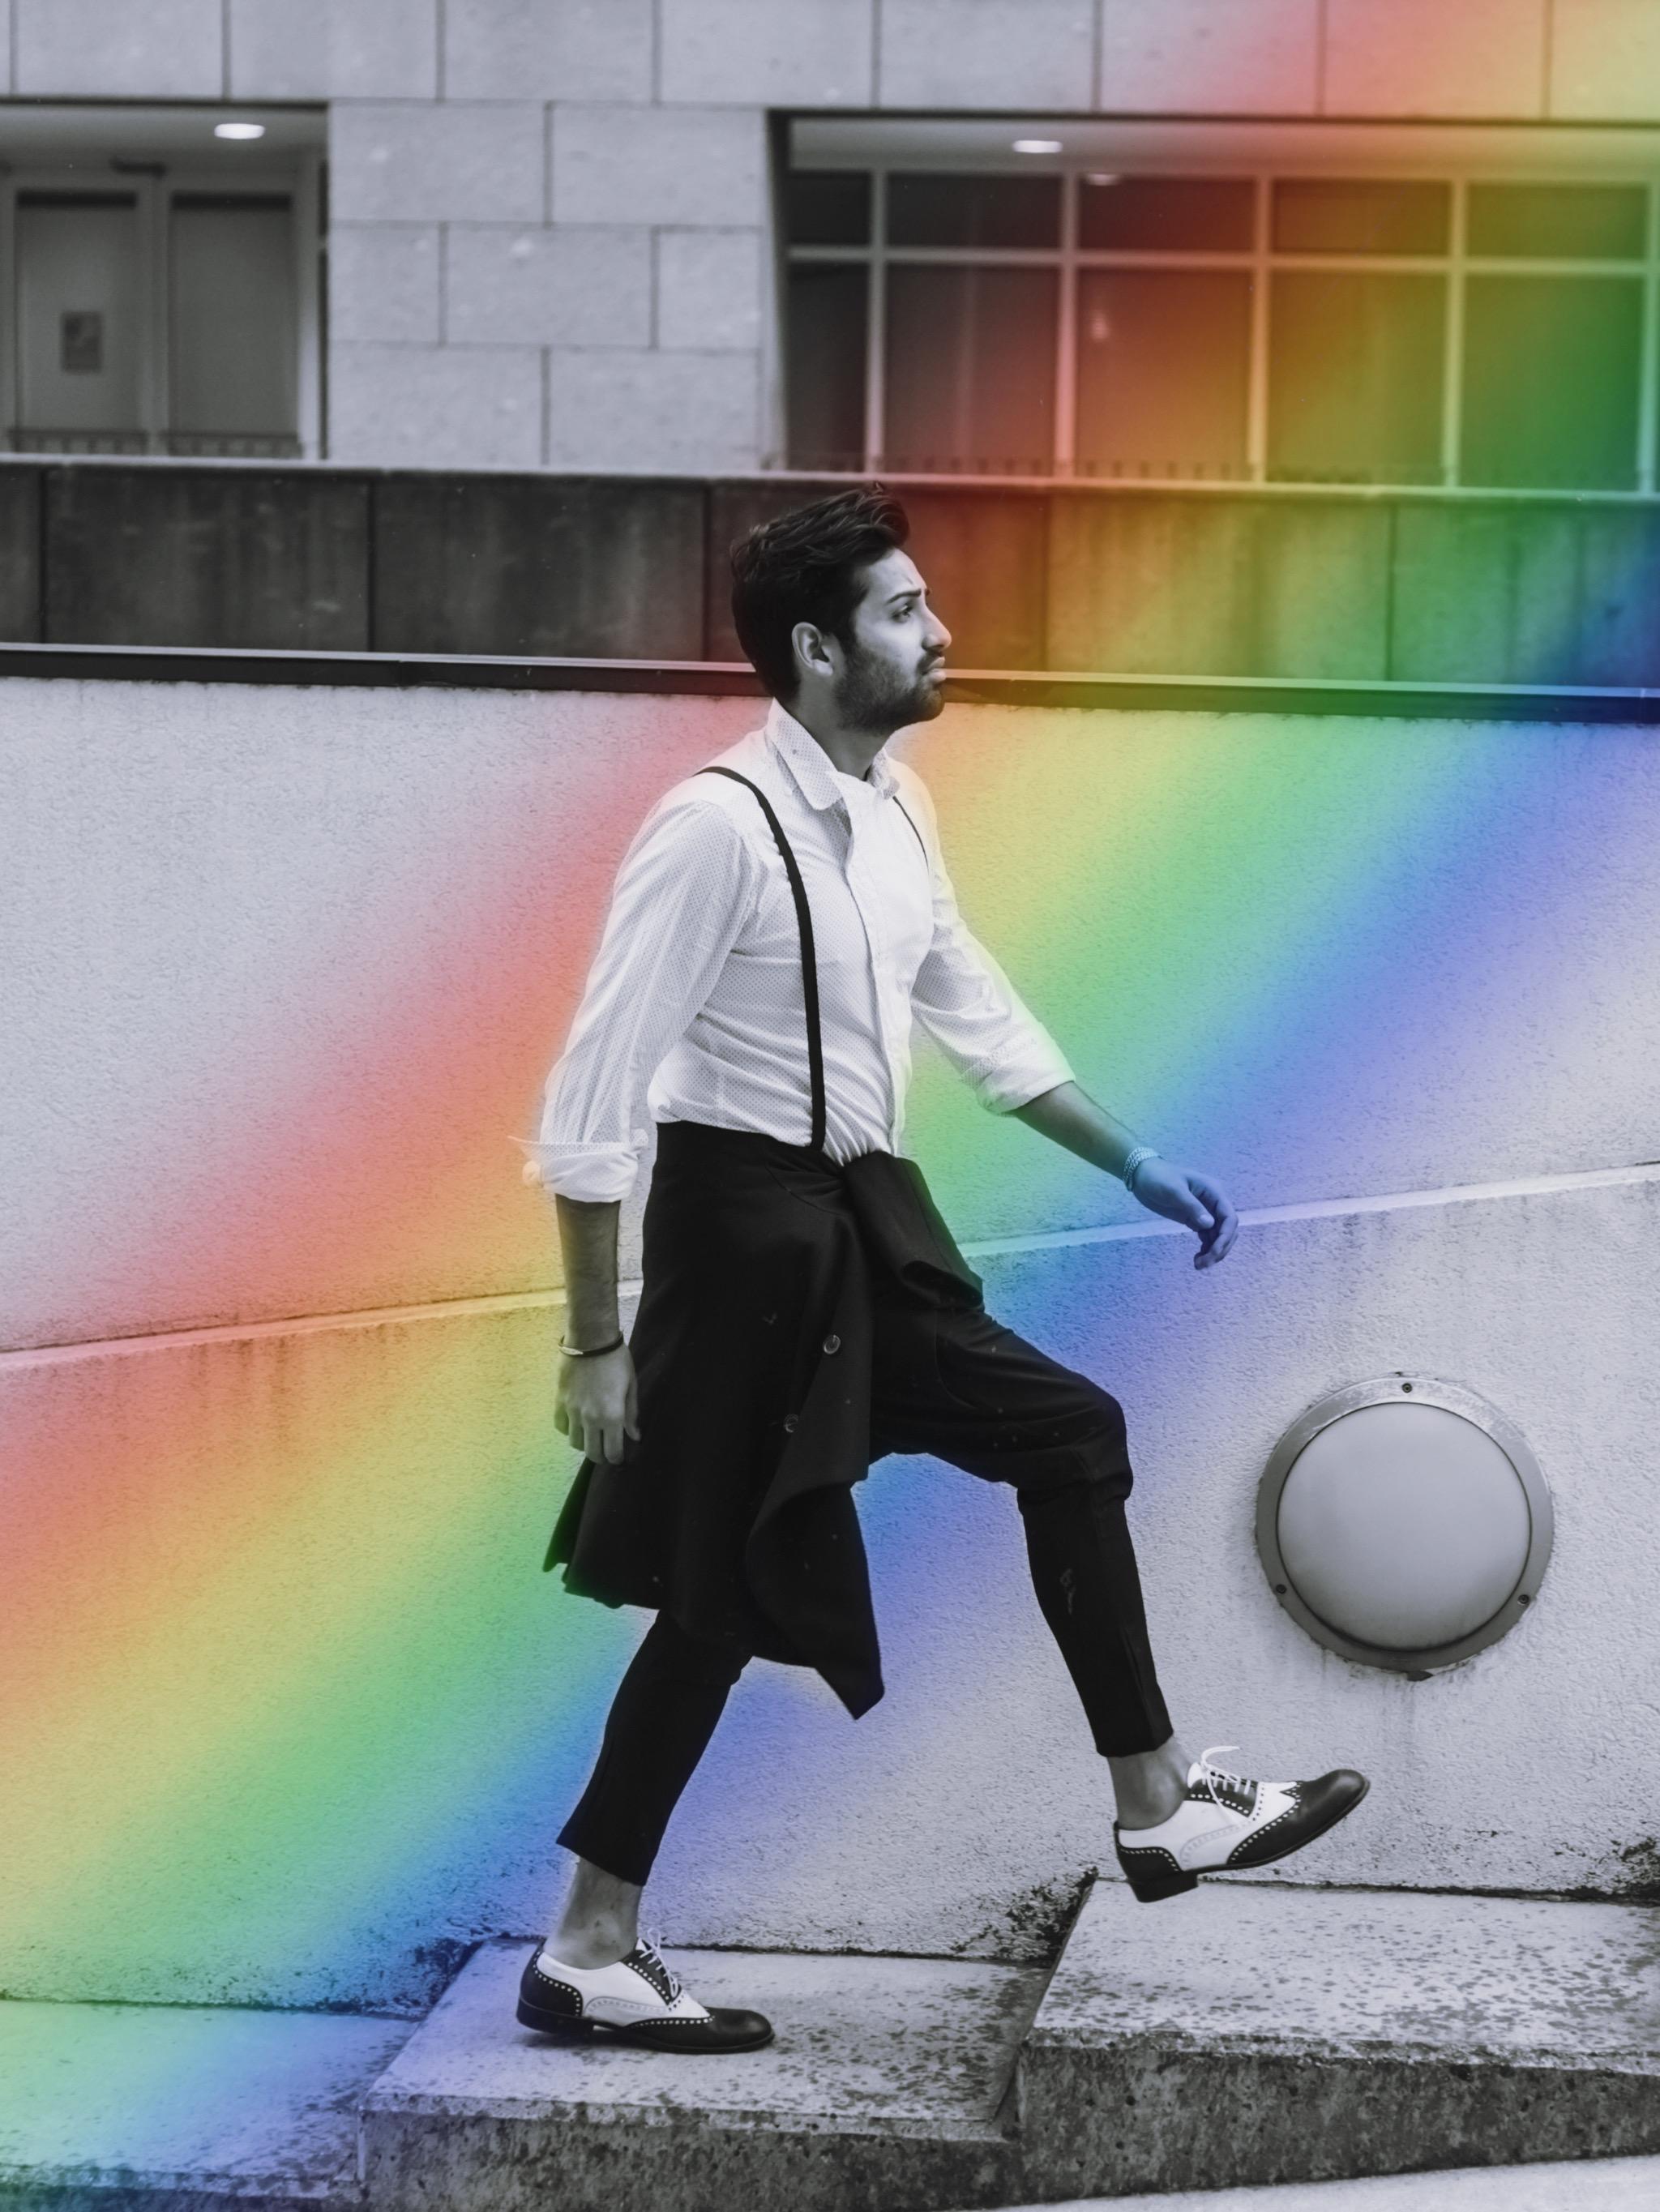 #freetoedit #rainbow #rainbowcolors #rainbowbright #rainbowbrush #rainbowstroke #blackandwhite